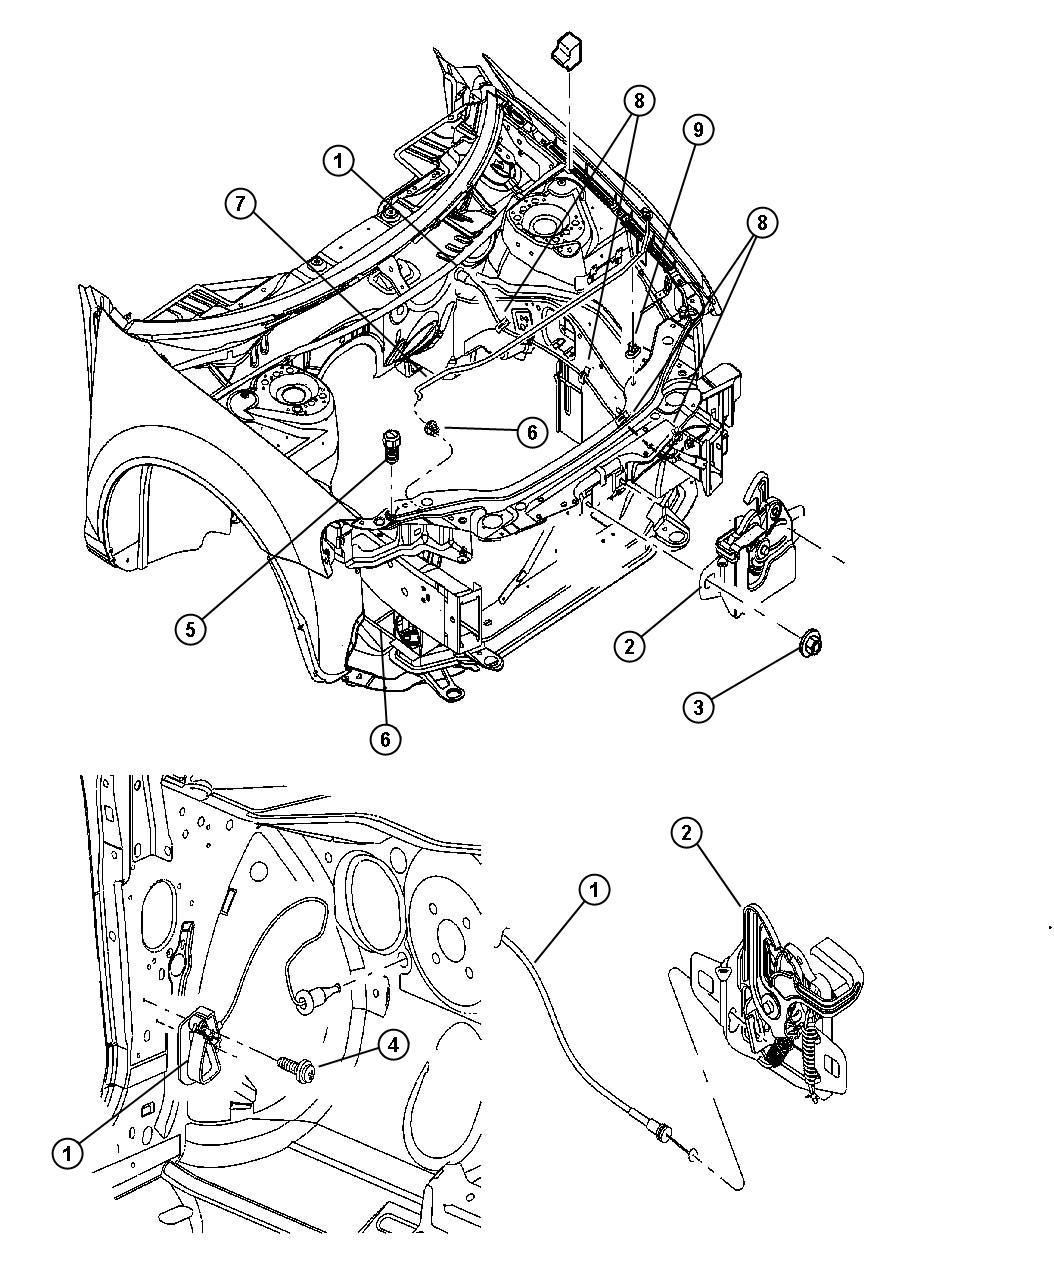 2002 Chrysler Sebring Latch. Hood. Release, mopar, body